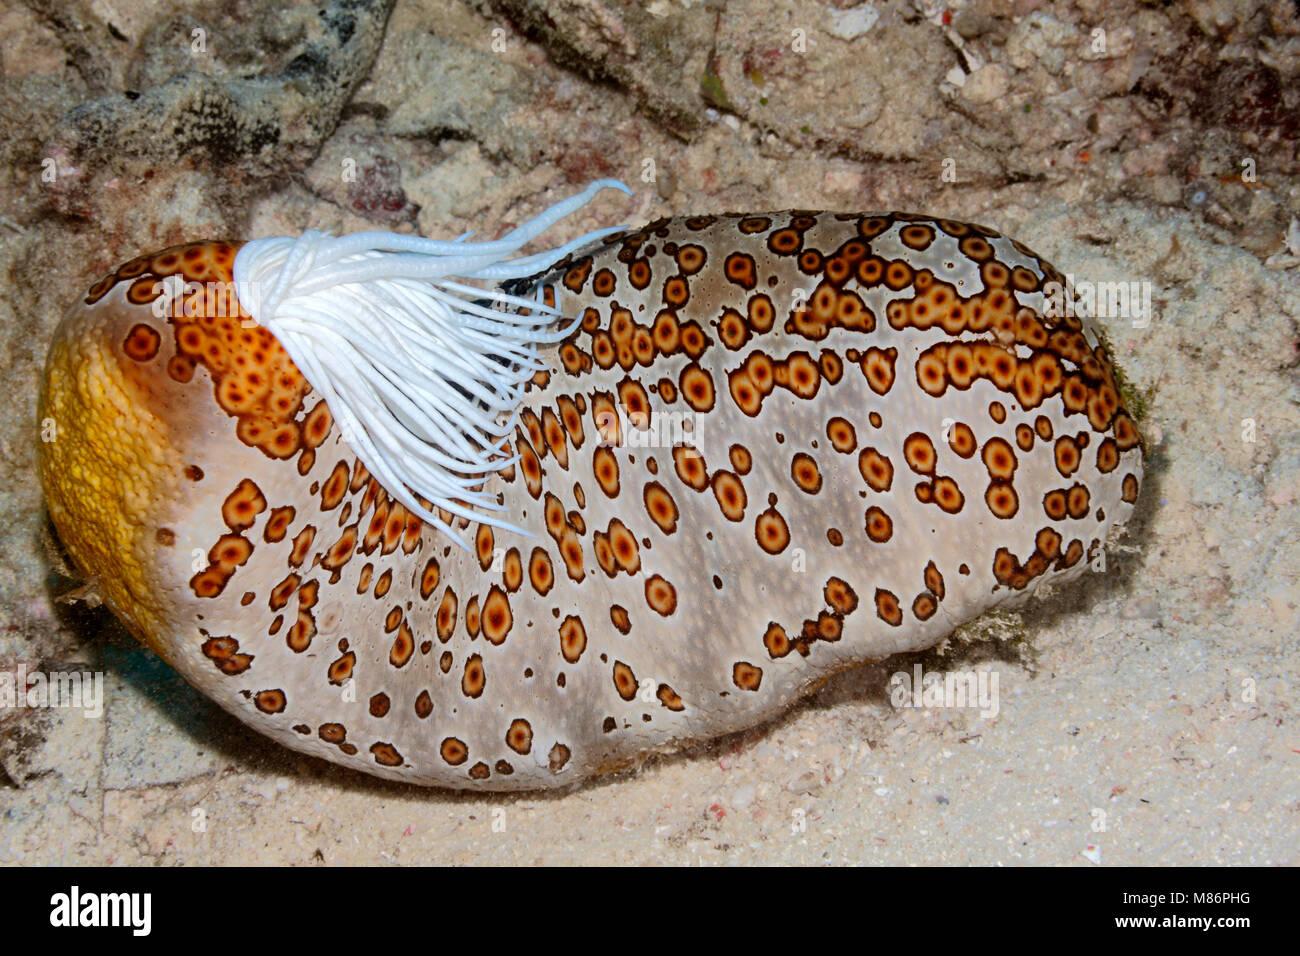 leopard-sea-cucumber-bohadschia-argus-extruding-sticky-white-cuvierian-M86PHG.jpg